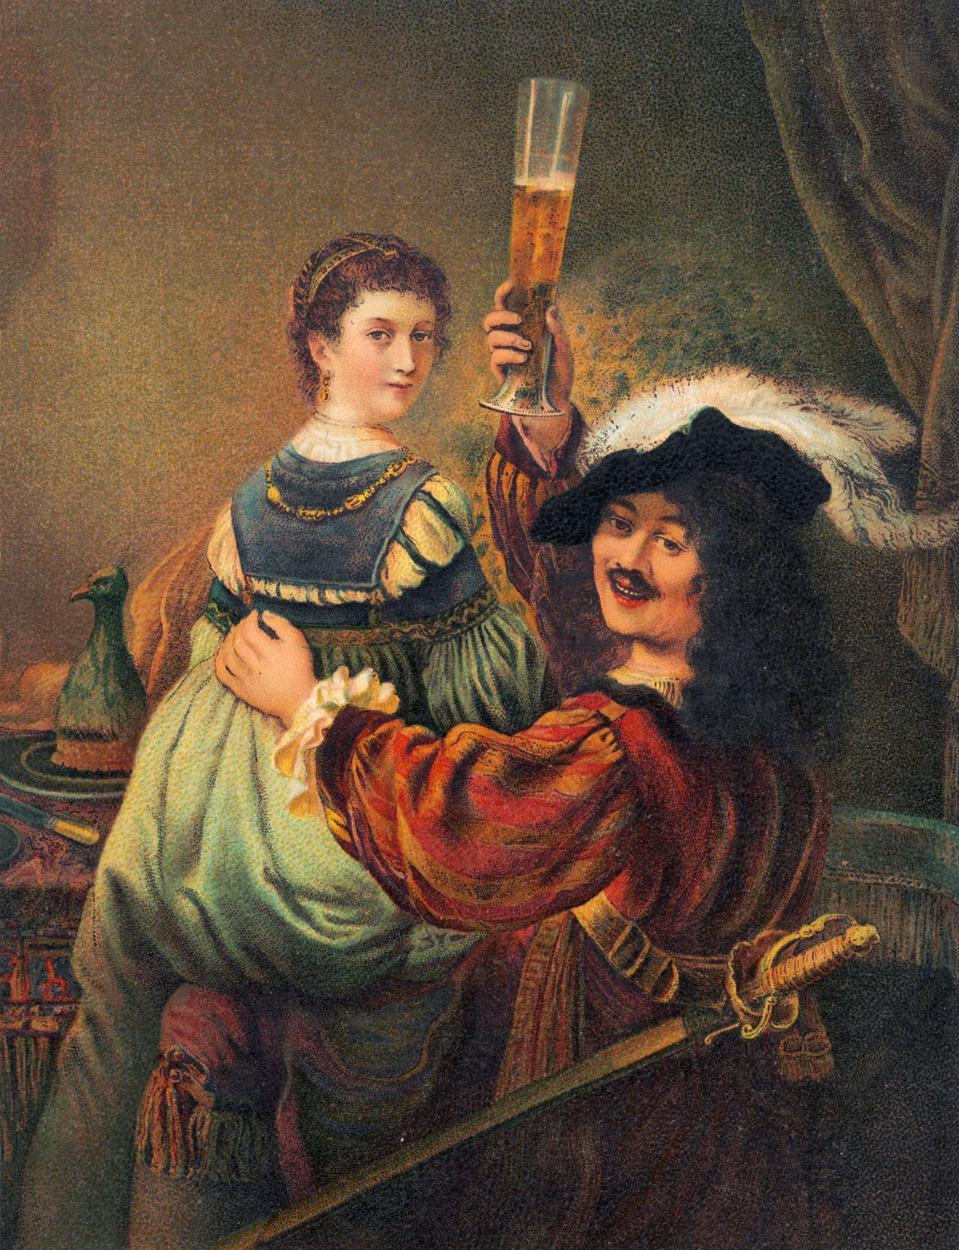 Rembrandt van Rijn - Self portrait with his wife Saskia.